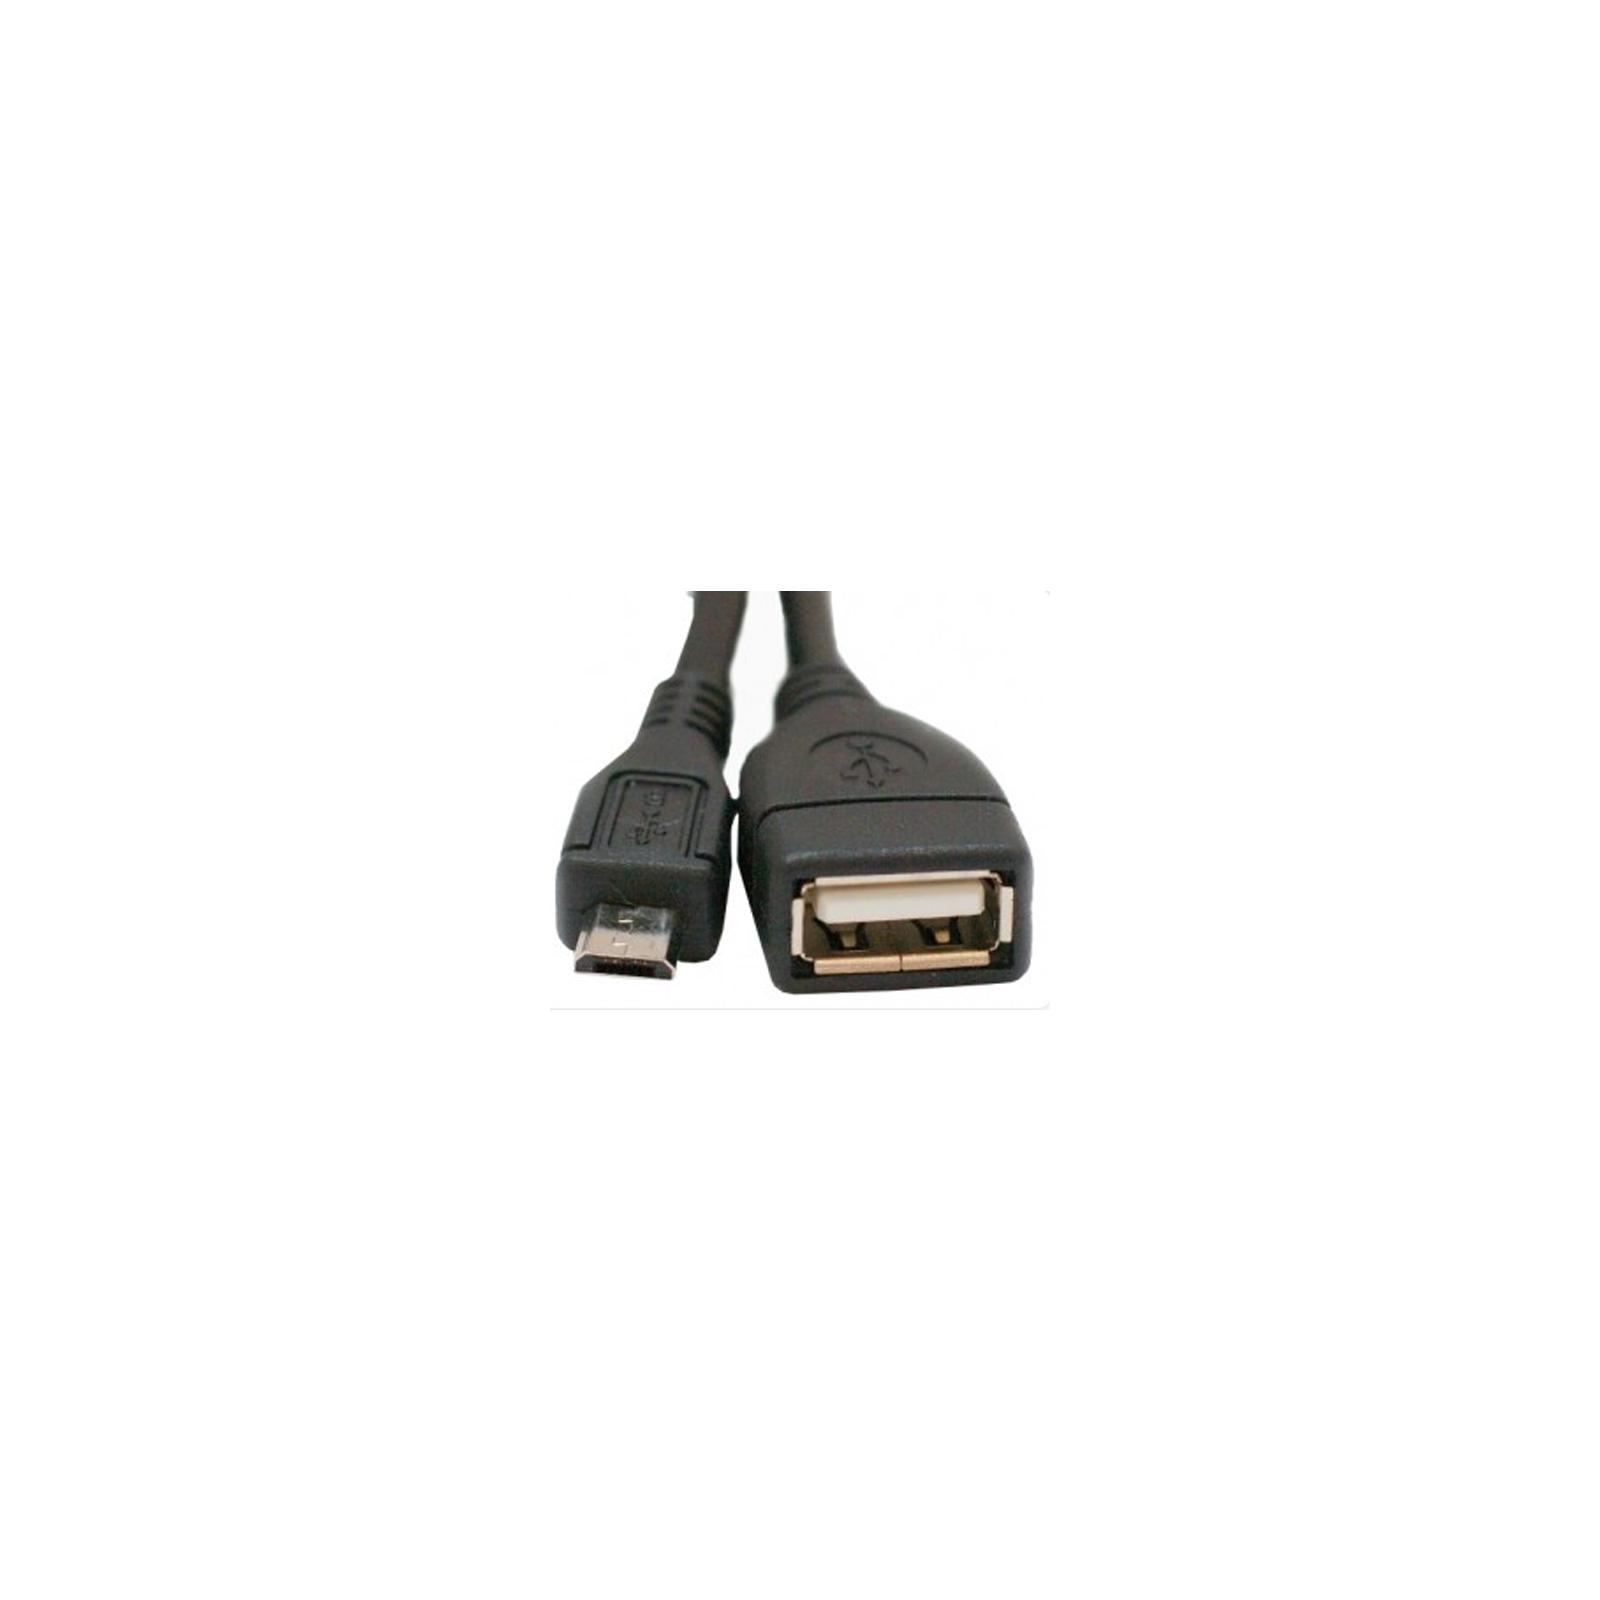 Дата кабель USB 2.0 Micro 5P to AF OTG 0.8m Atcom (16028)